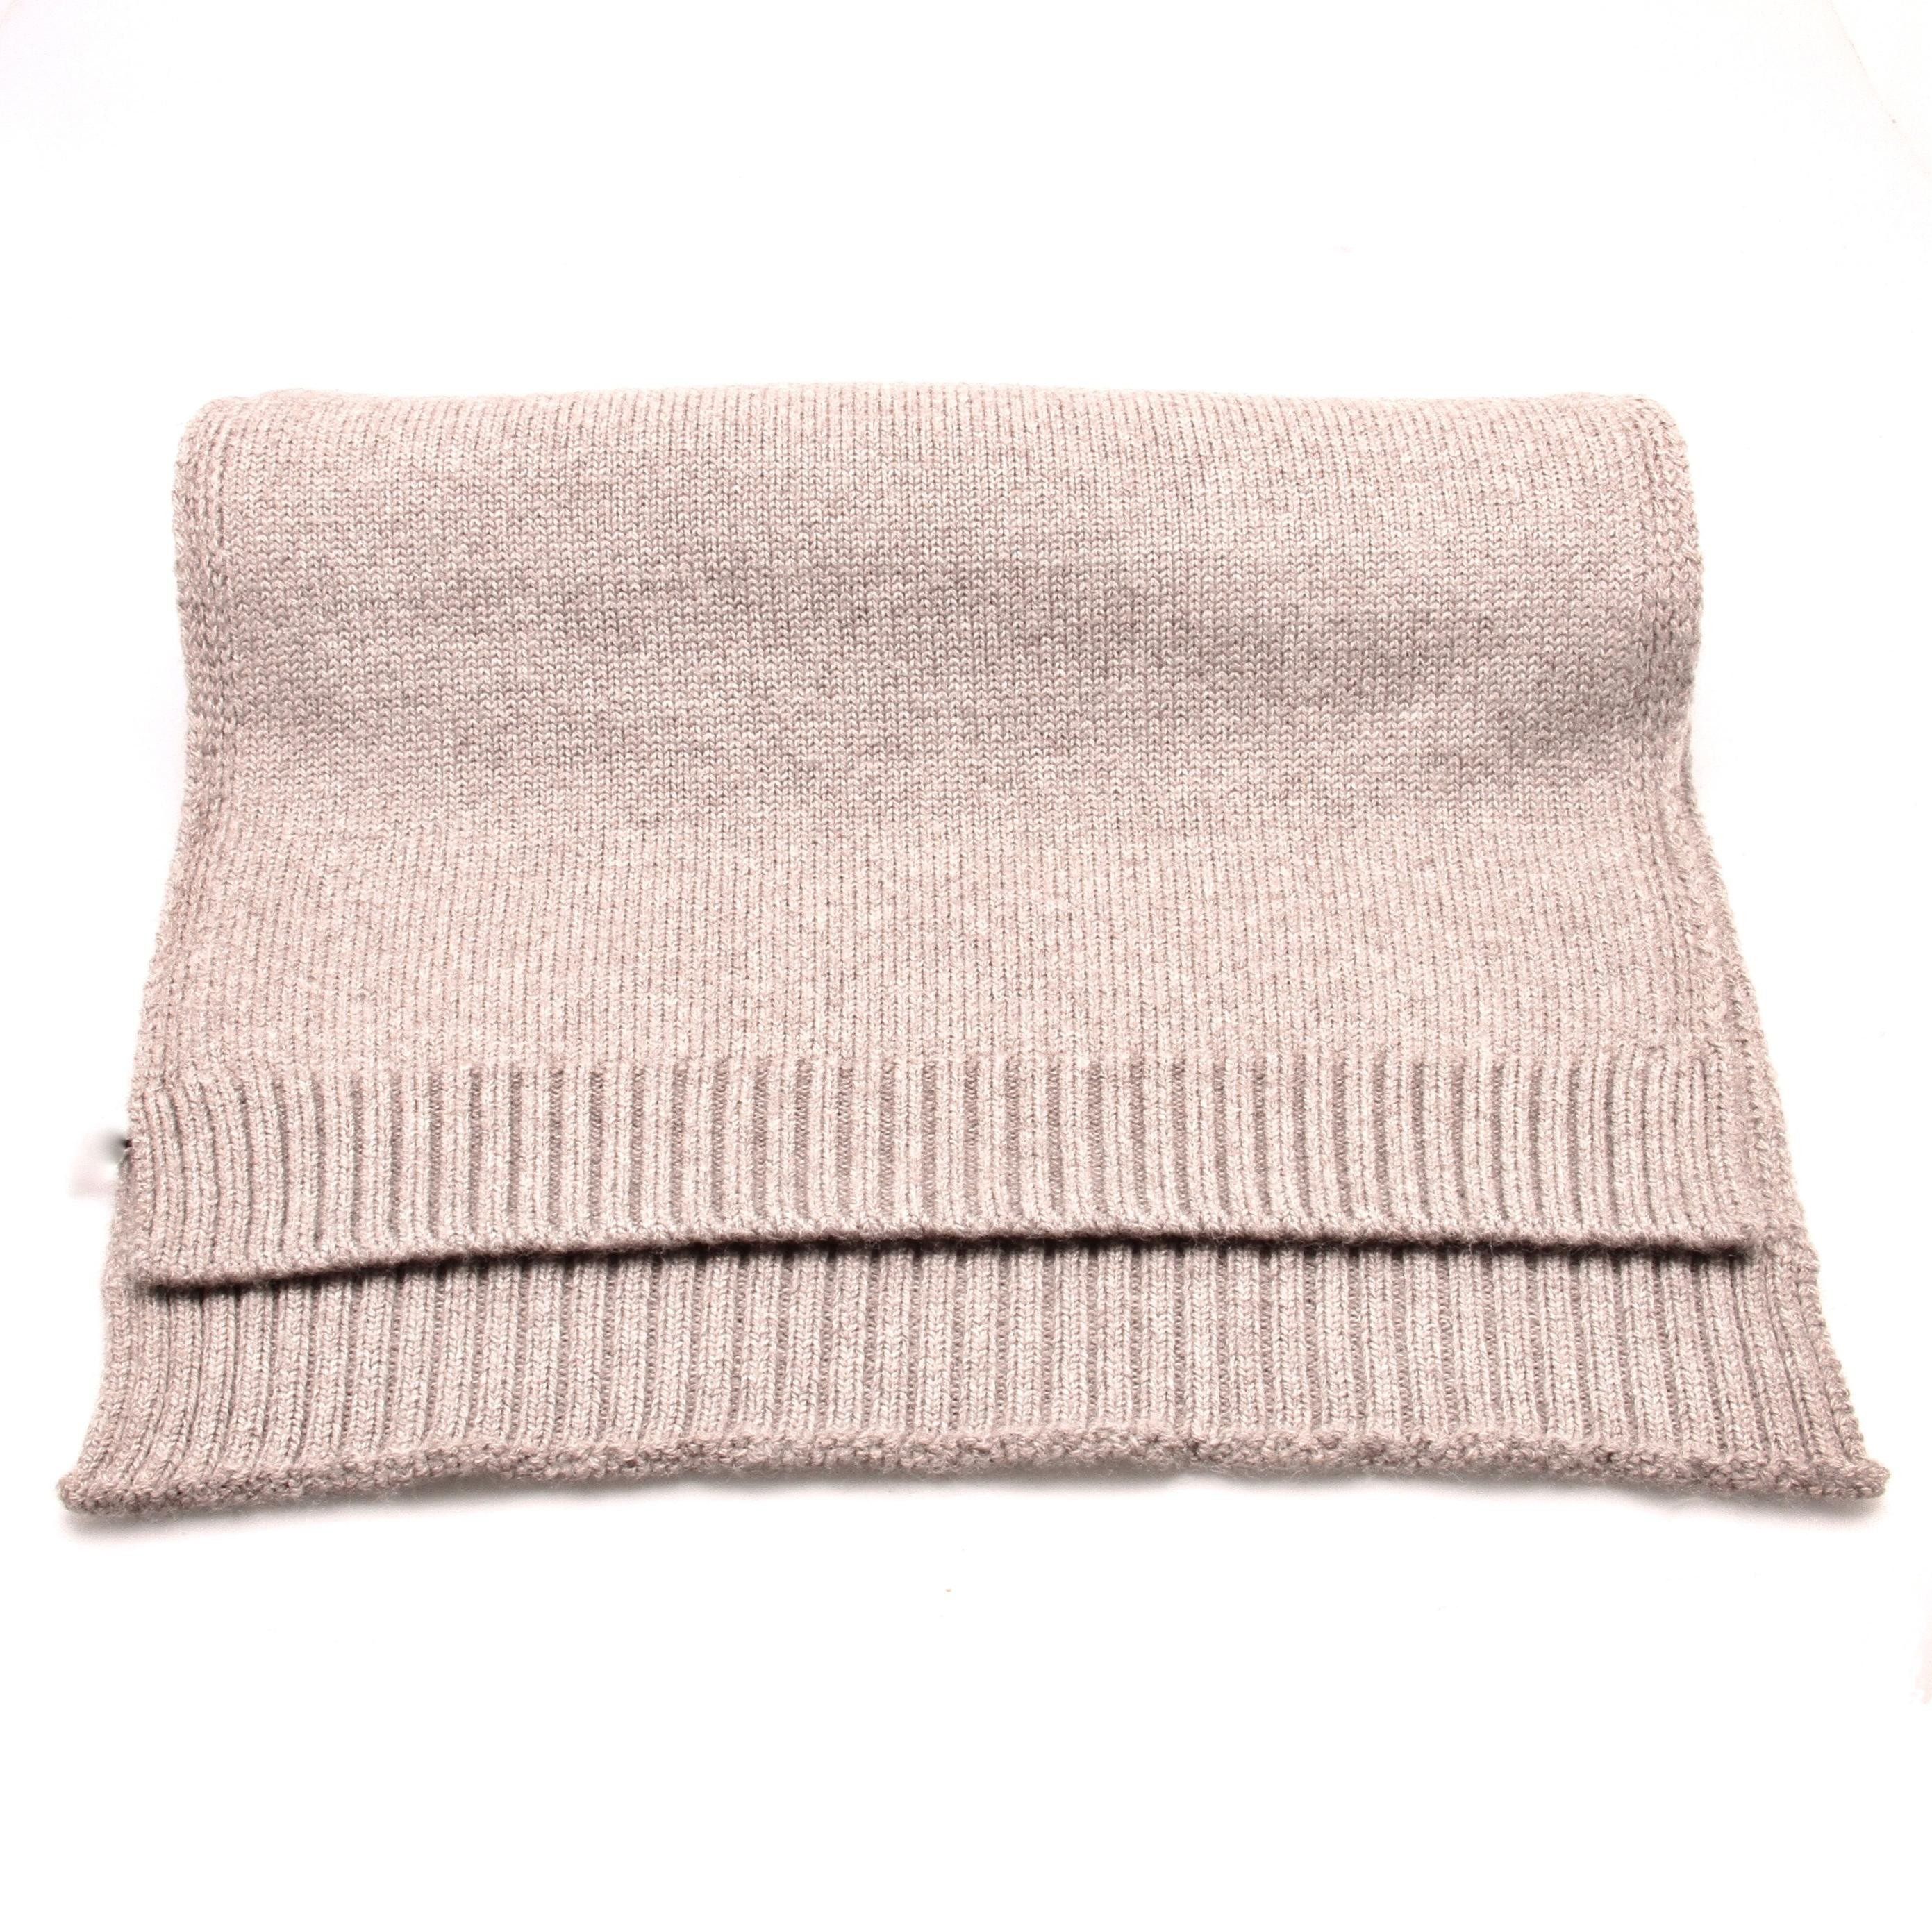 Echarpe Beige - Pure laine de Merinos